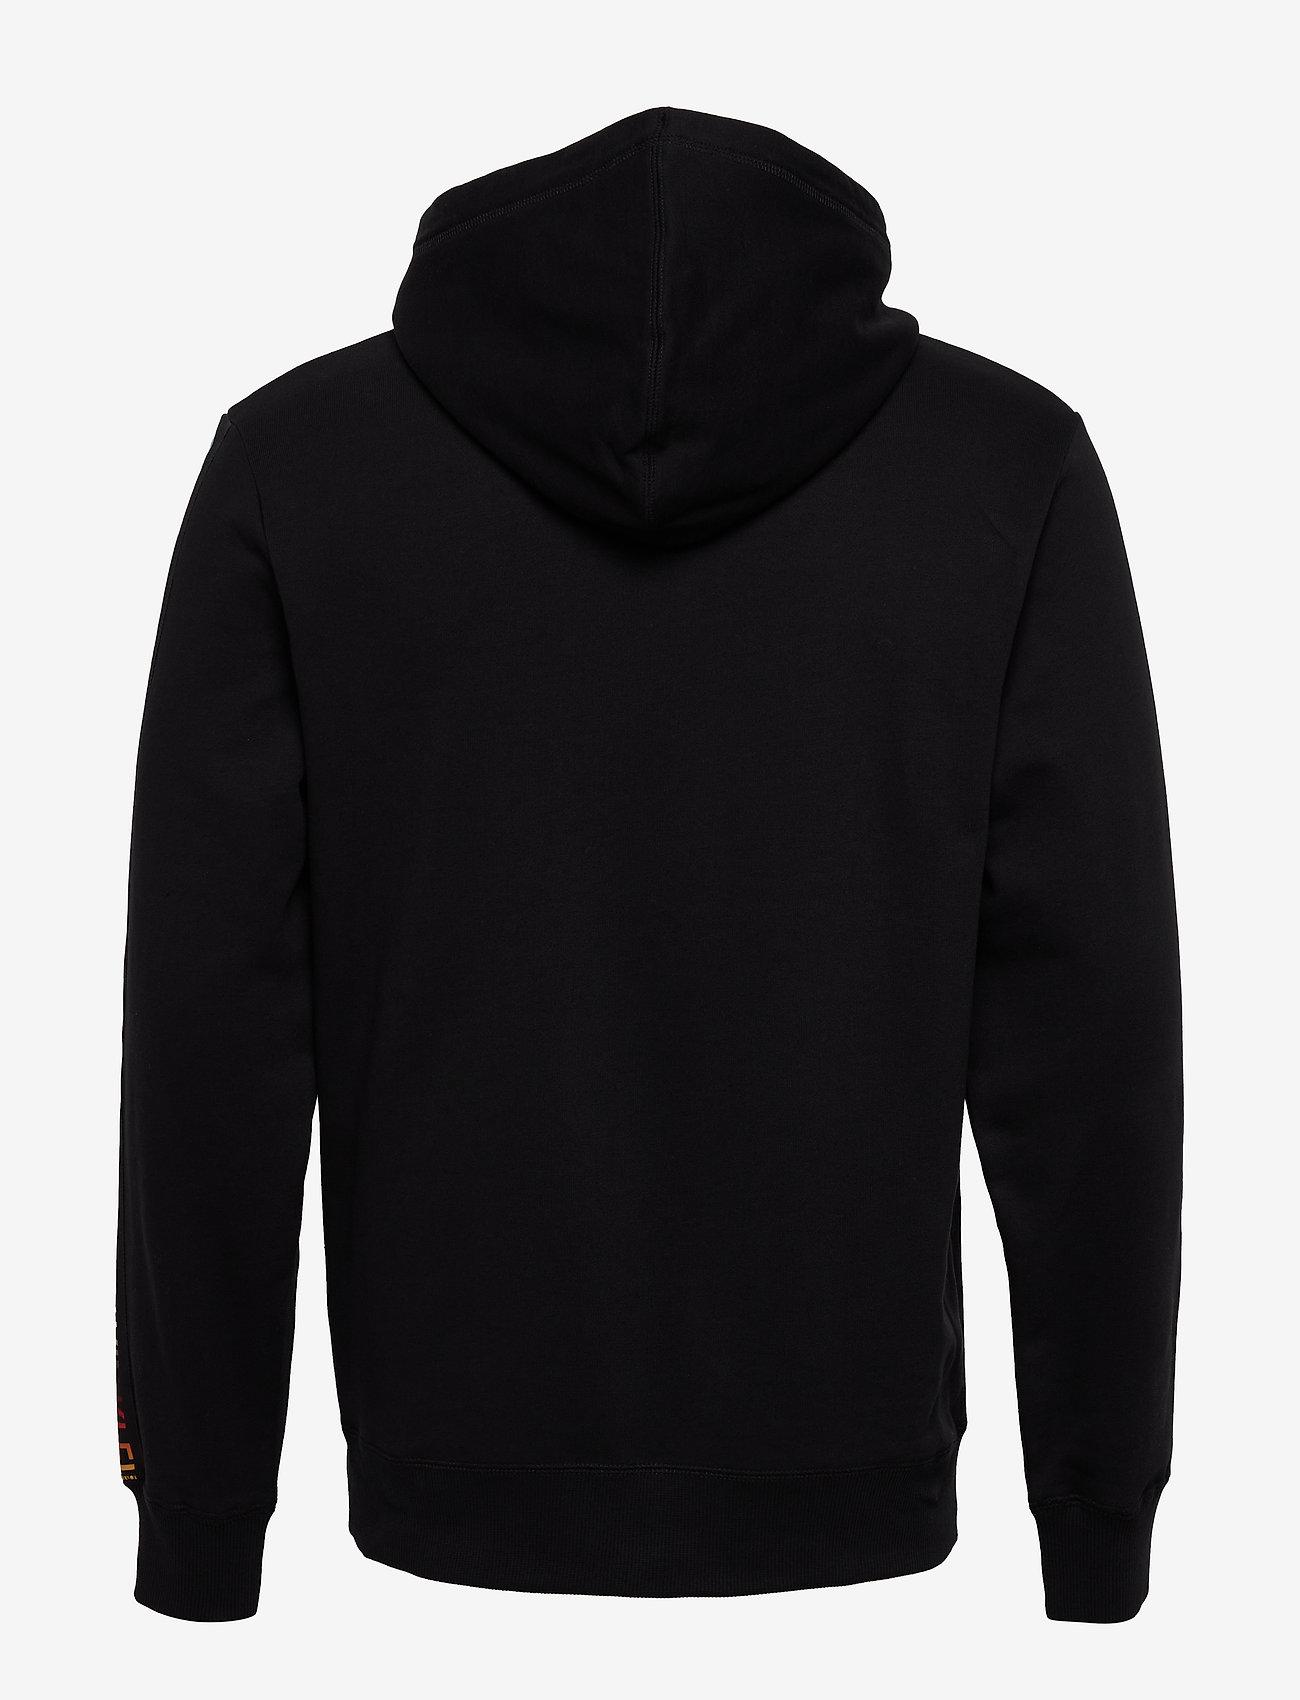 Calvin Klein Jeans - SMALL FLAG REG - hoodies - ck black - 1